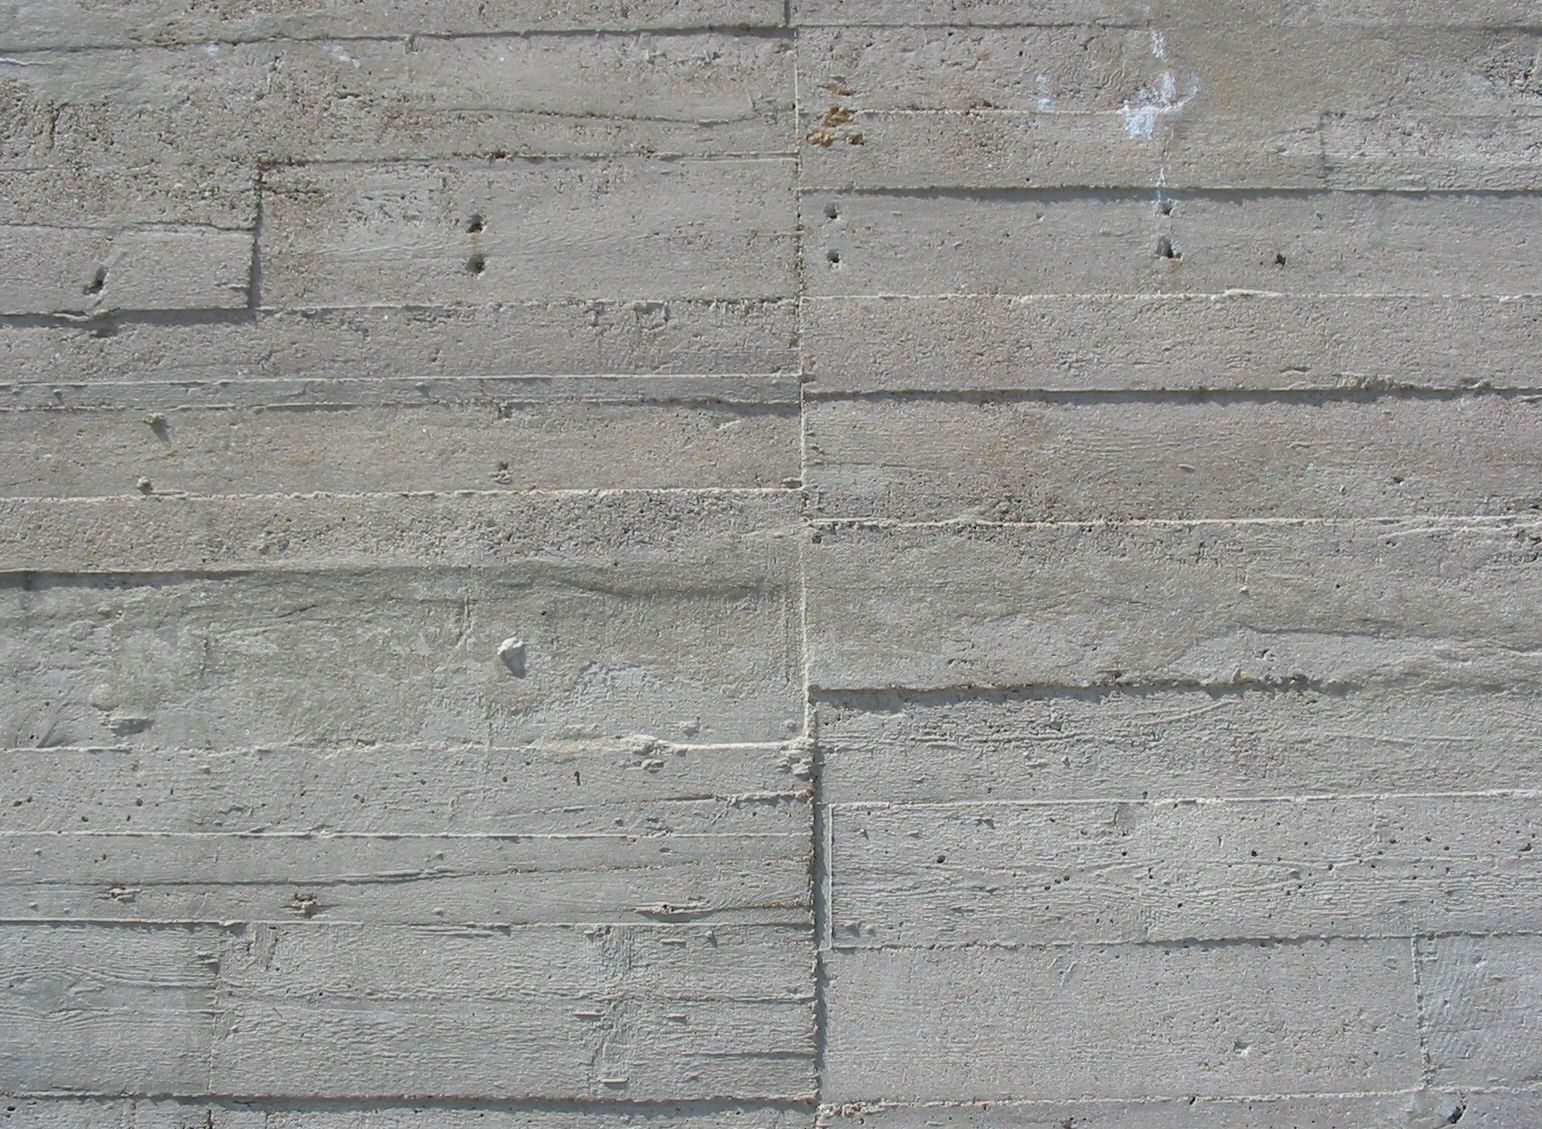 Wood Grain German Occupation Bunker Concrete 3 Jpg 1542 1129 Concrete Texture Concrete Concrete Wood